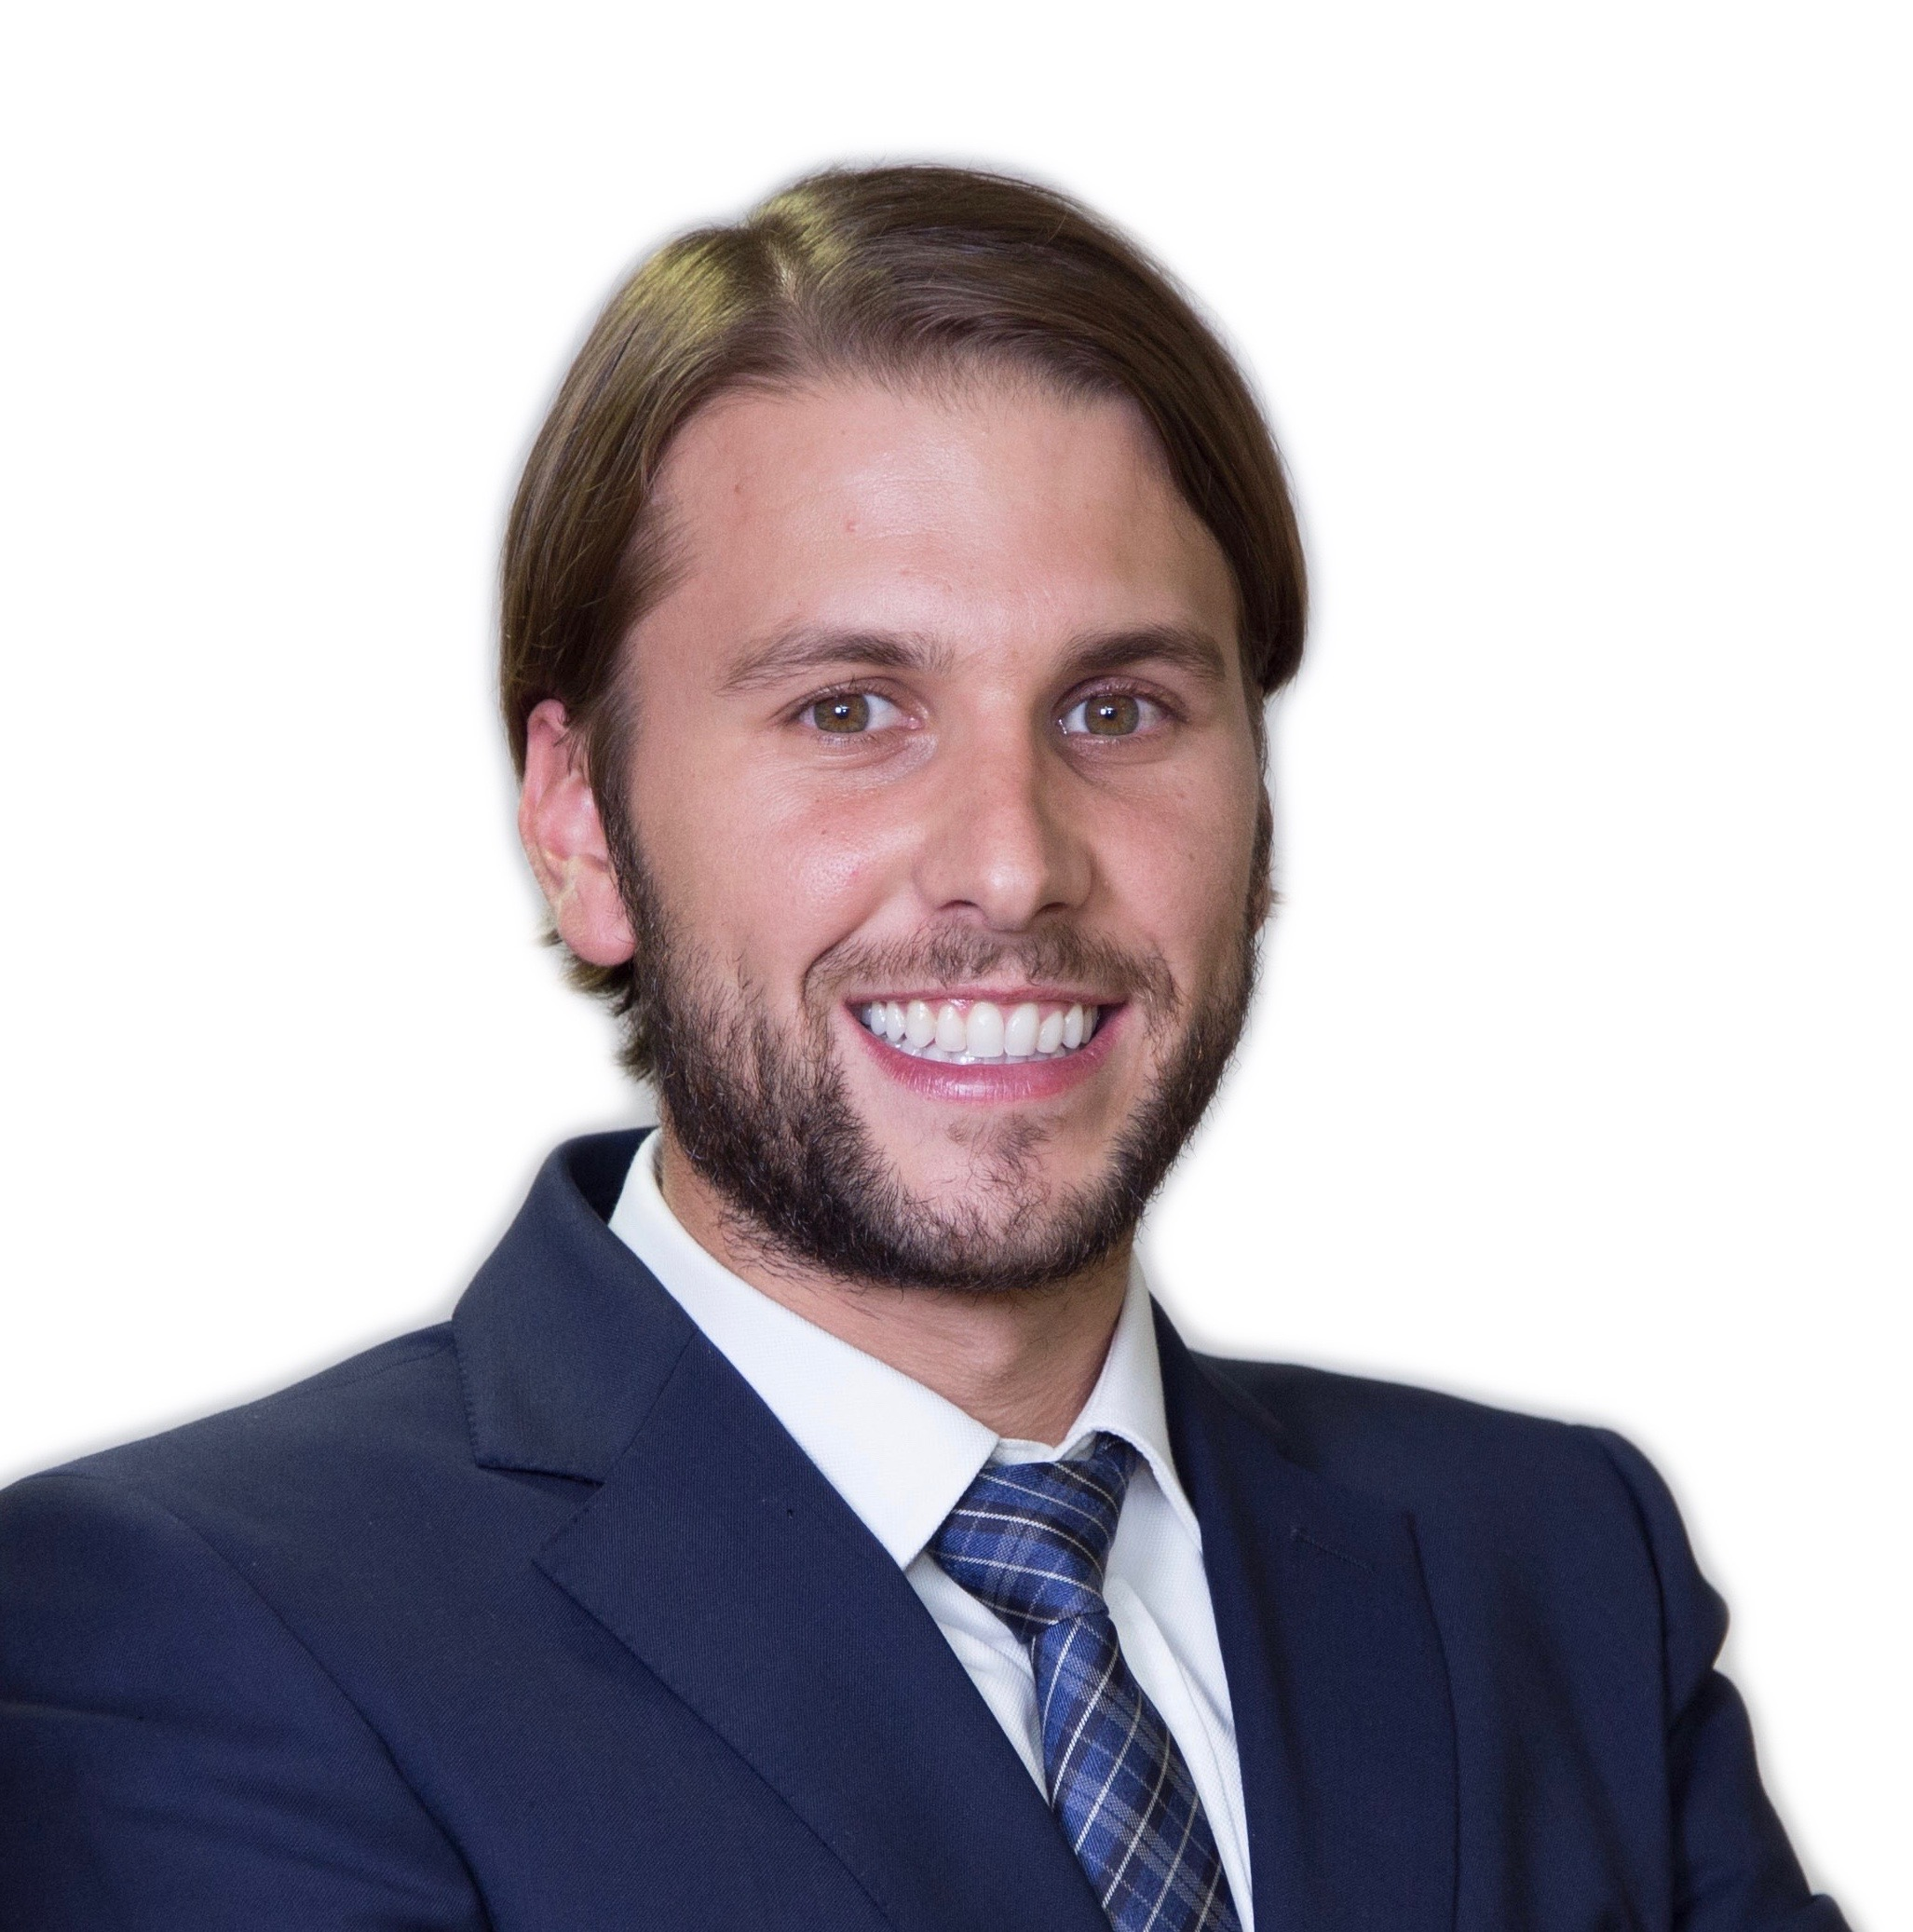 Pablo Castelo